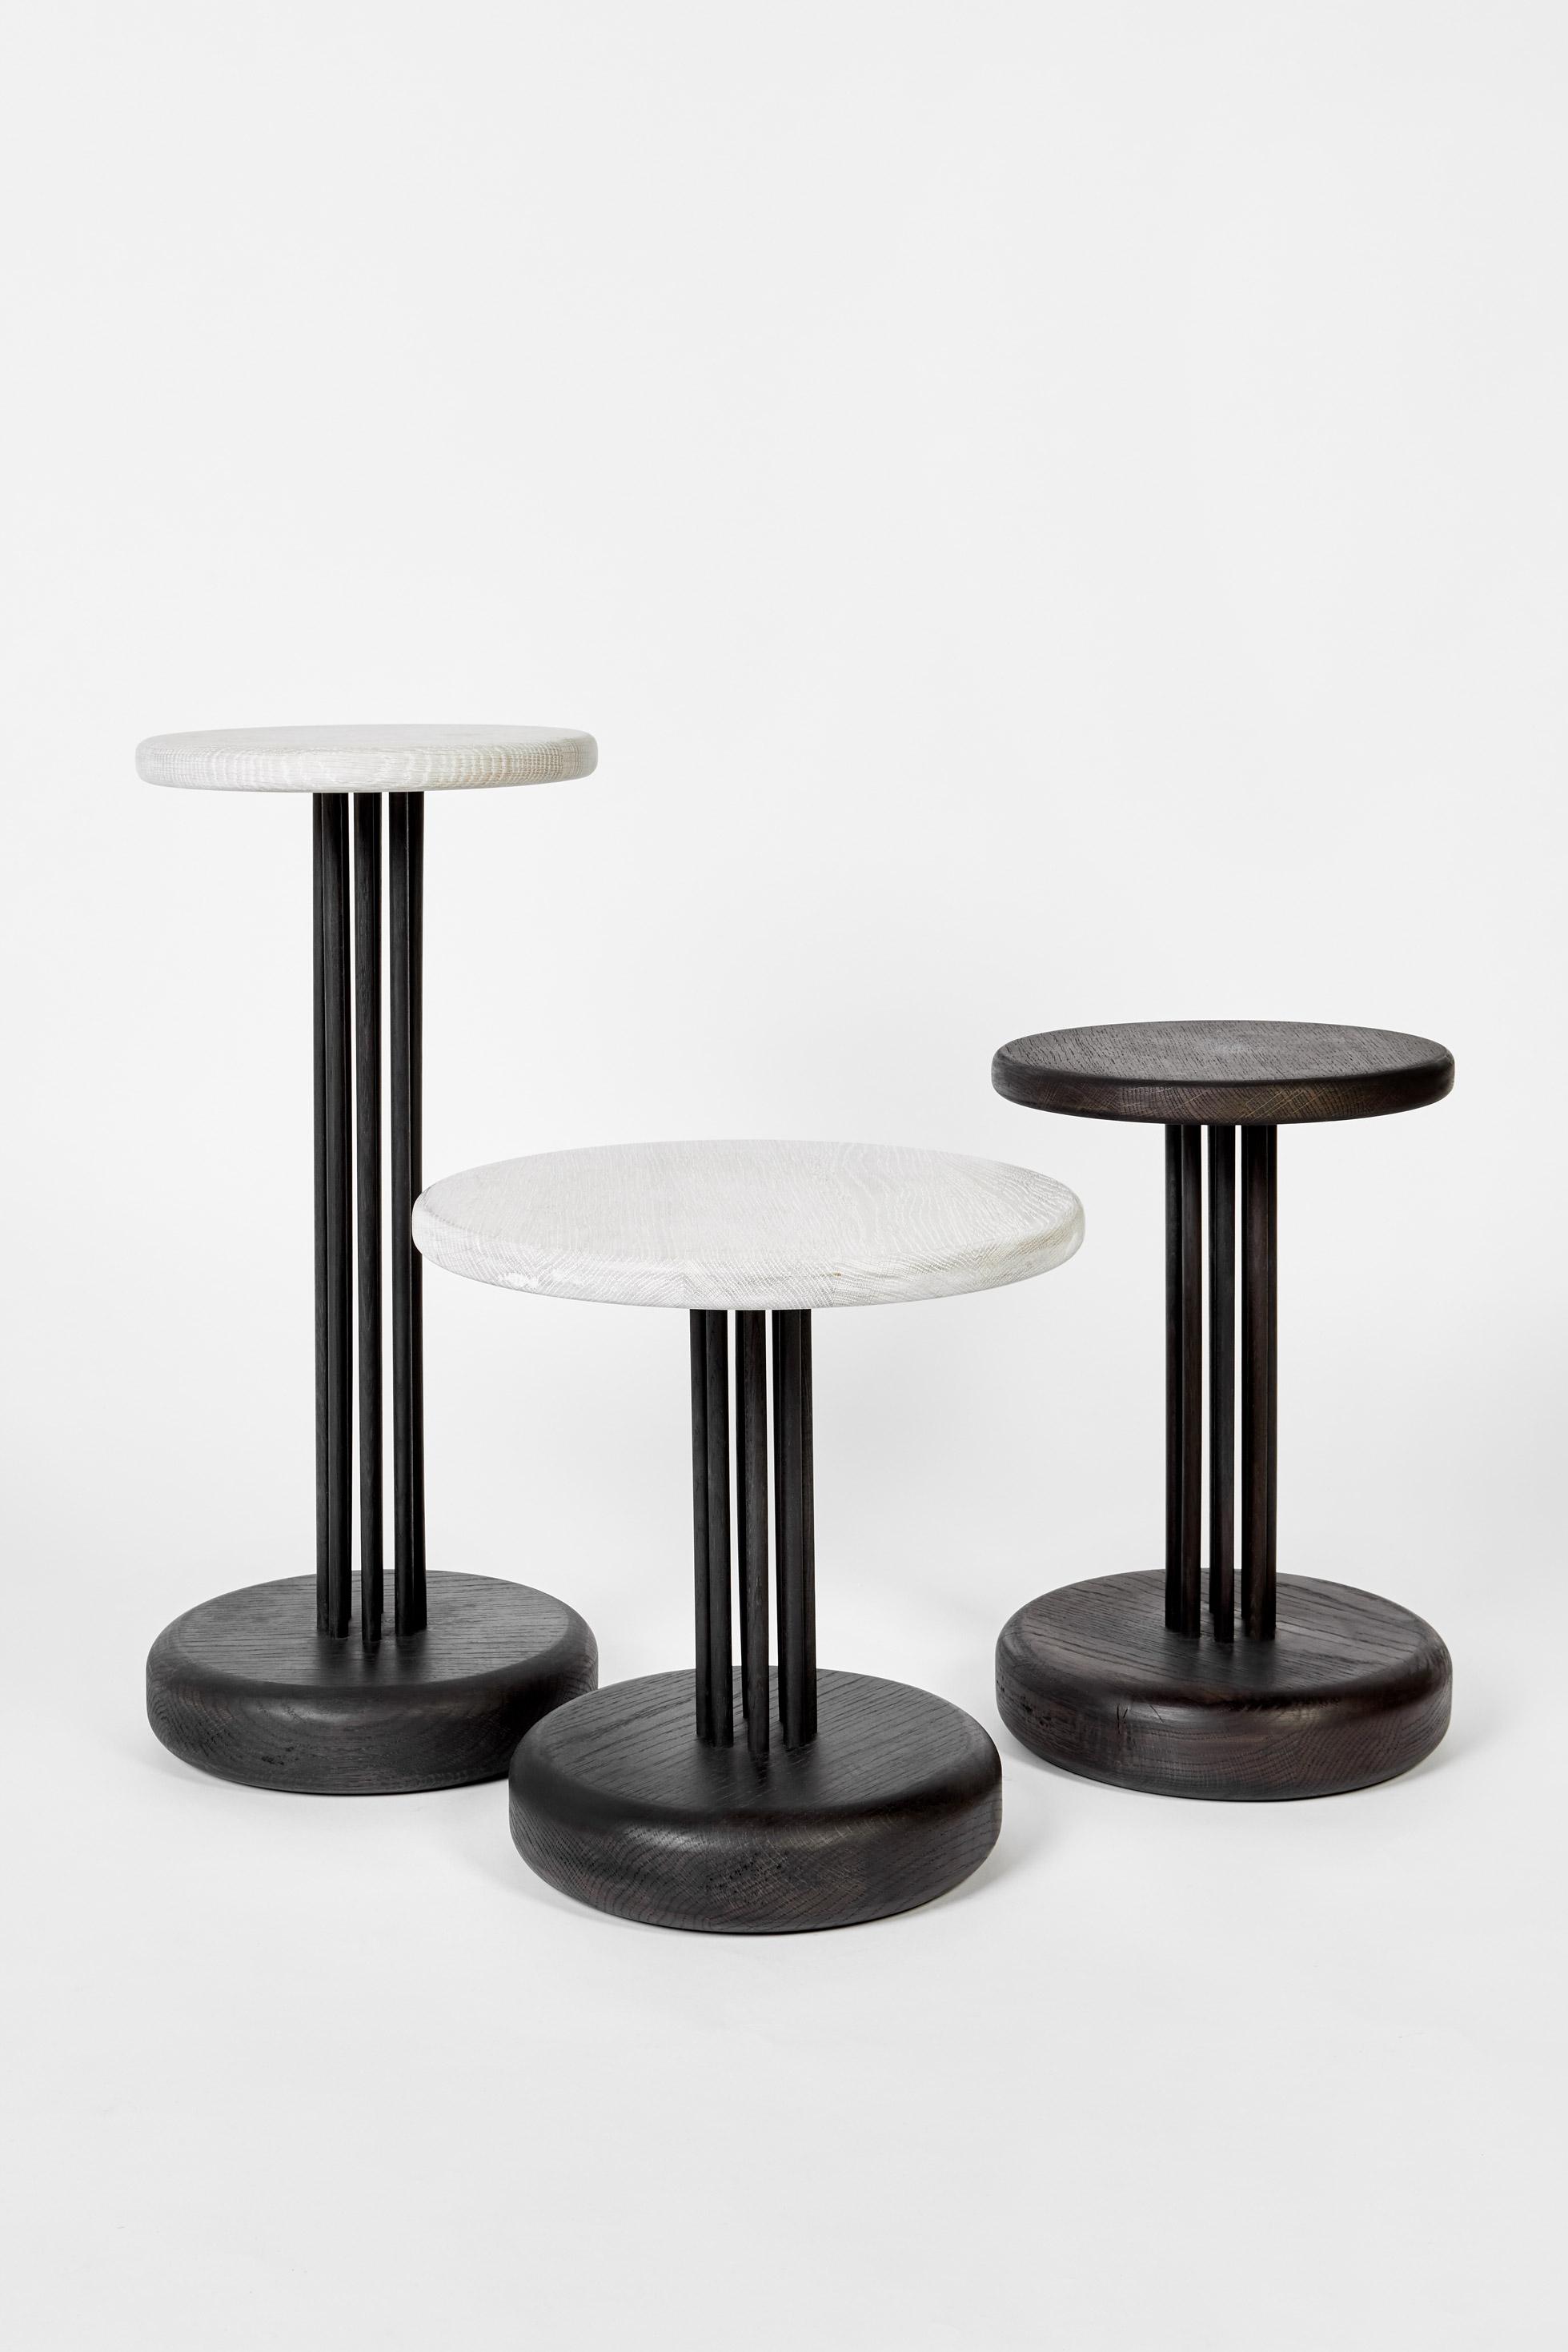 Pedestal-Group_01.jpg